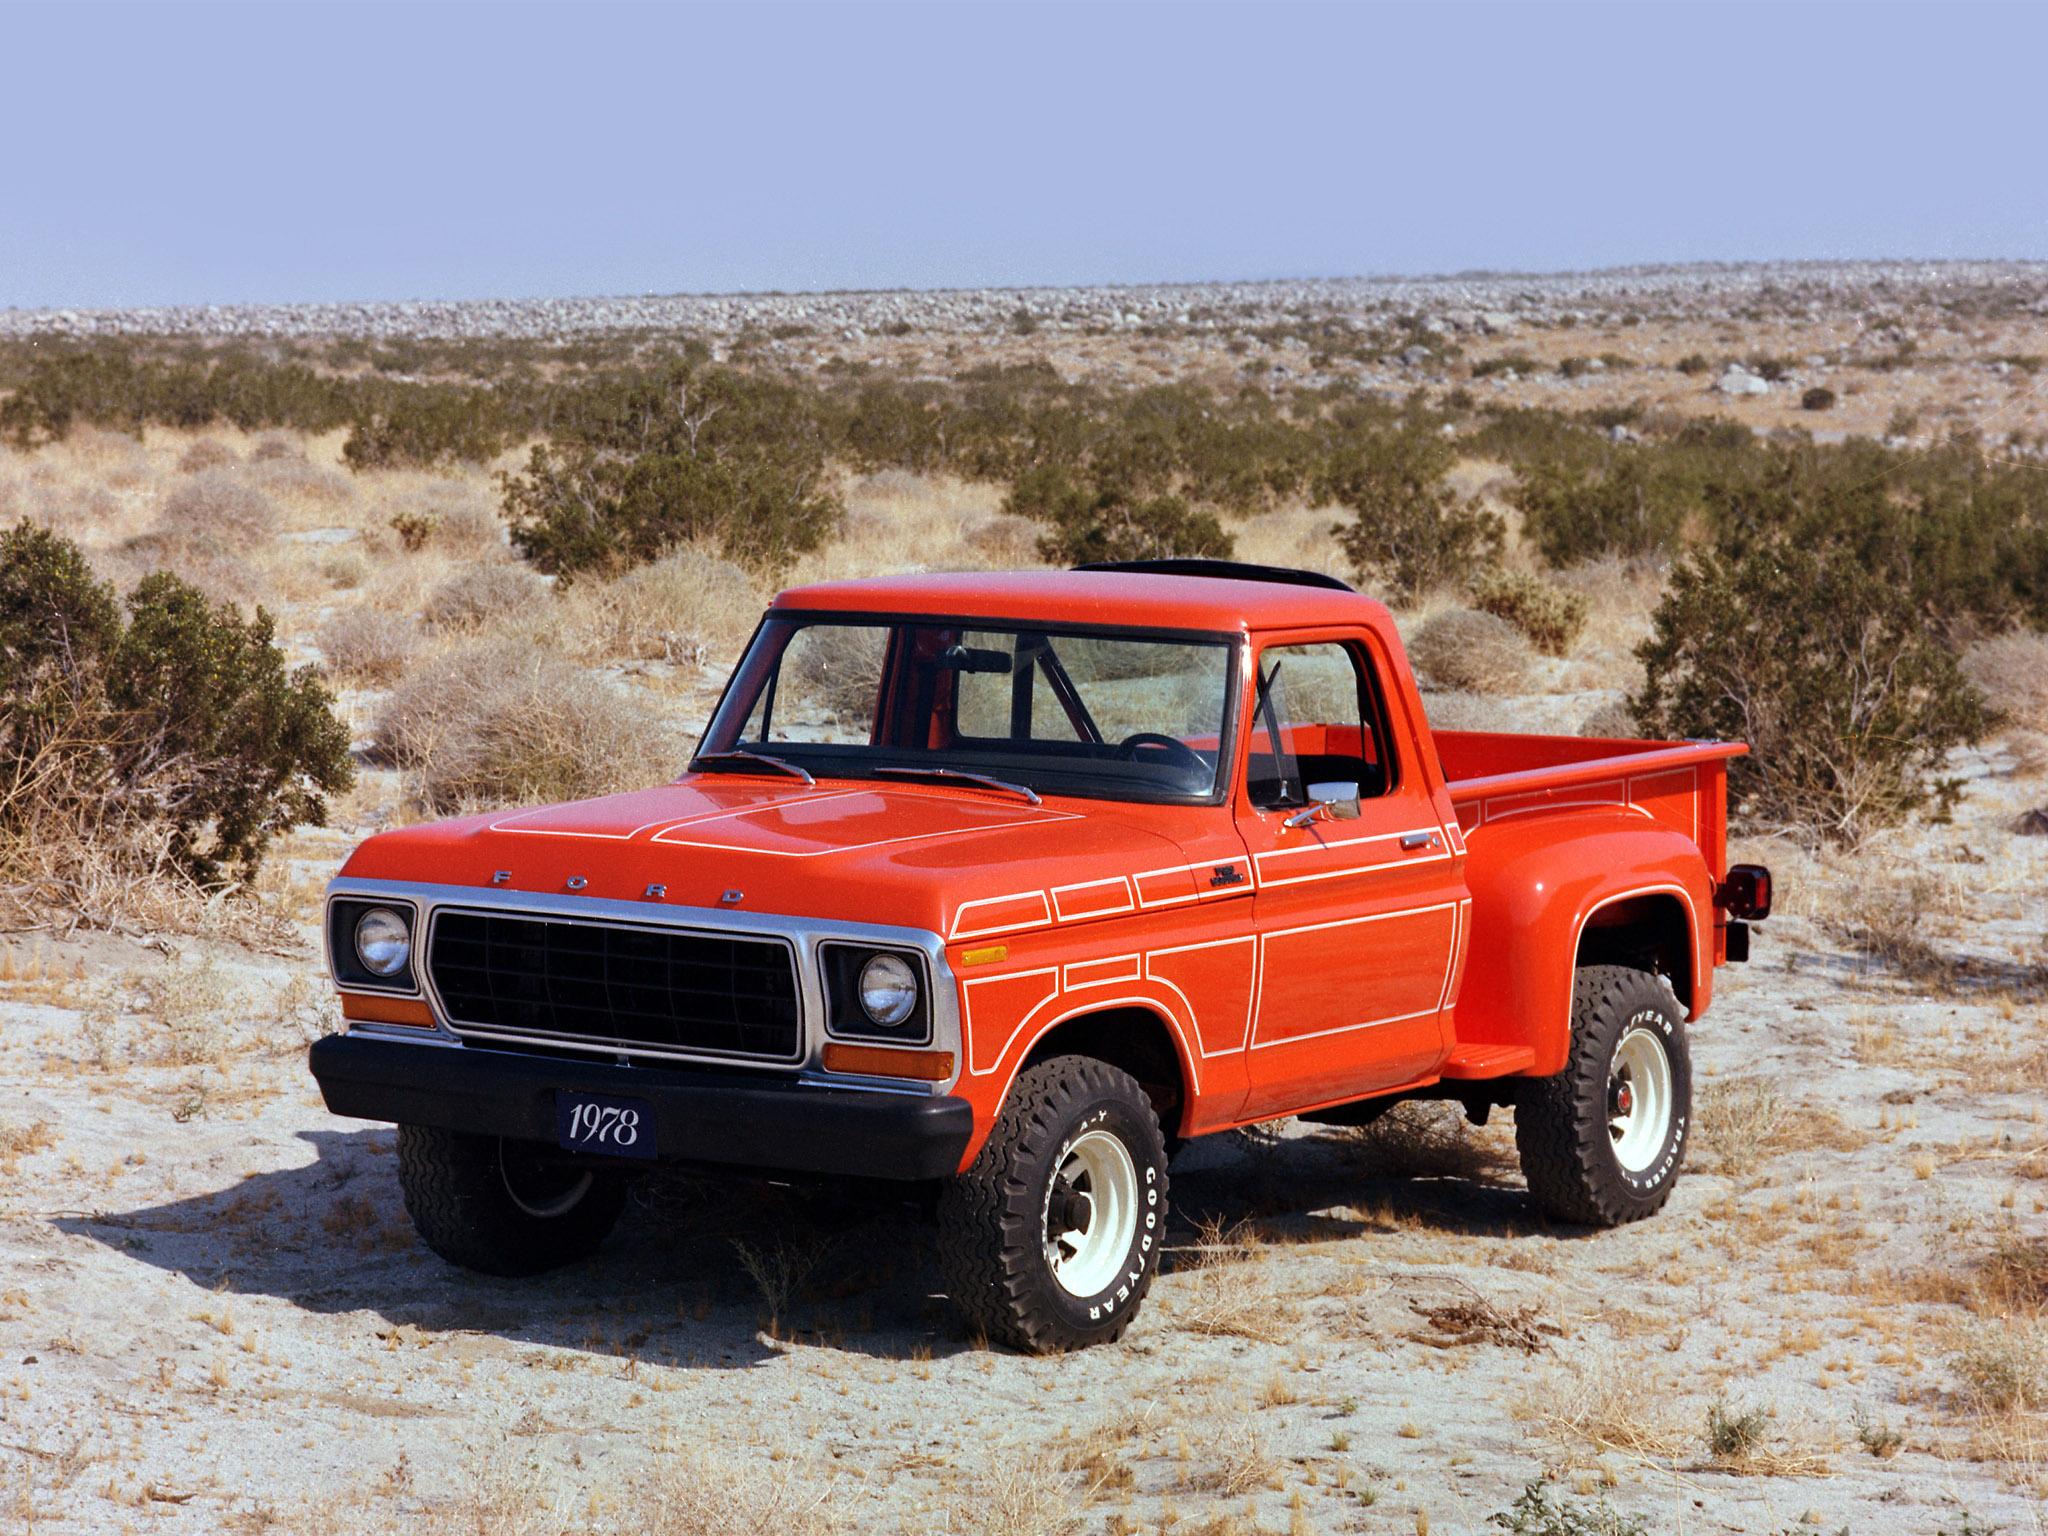 Ford Cars And Trucks : Classic ford truck wallpaper wallpapersafari